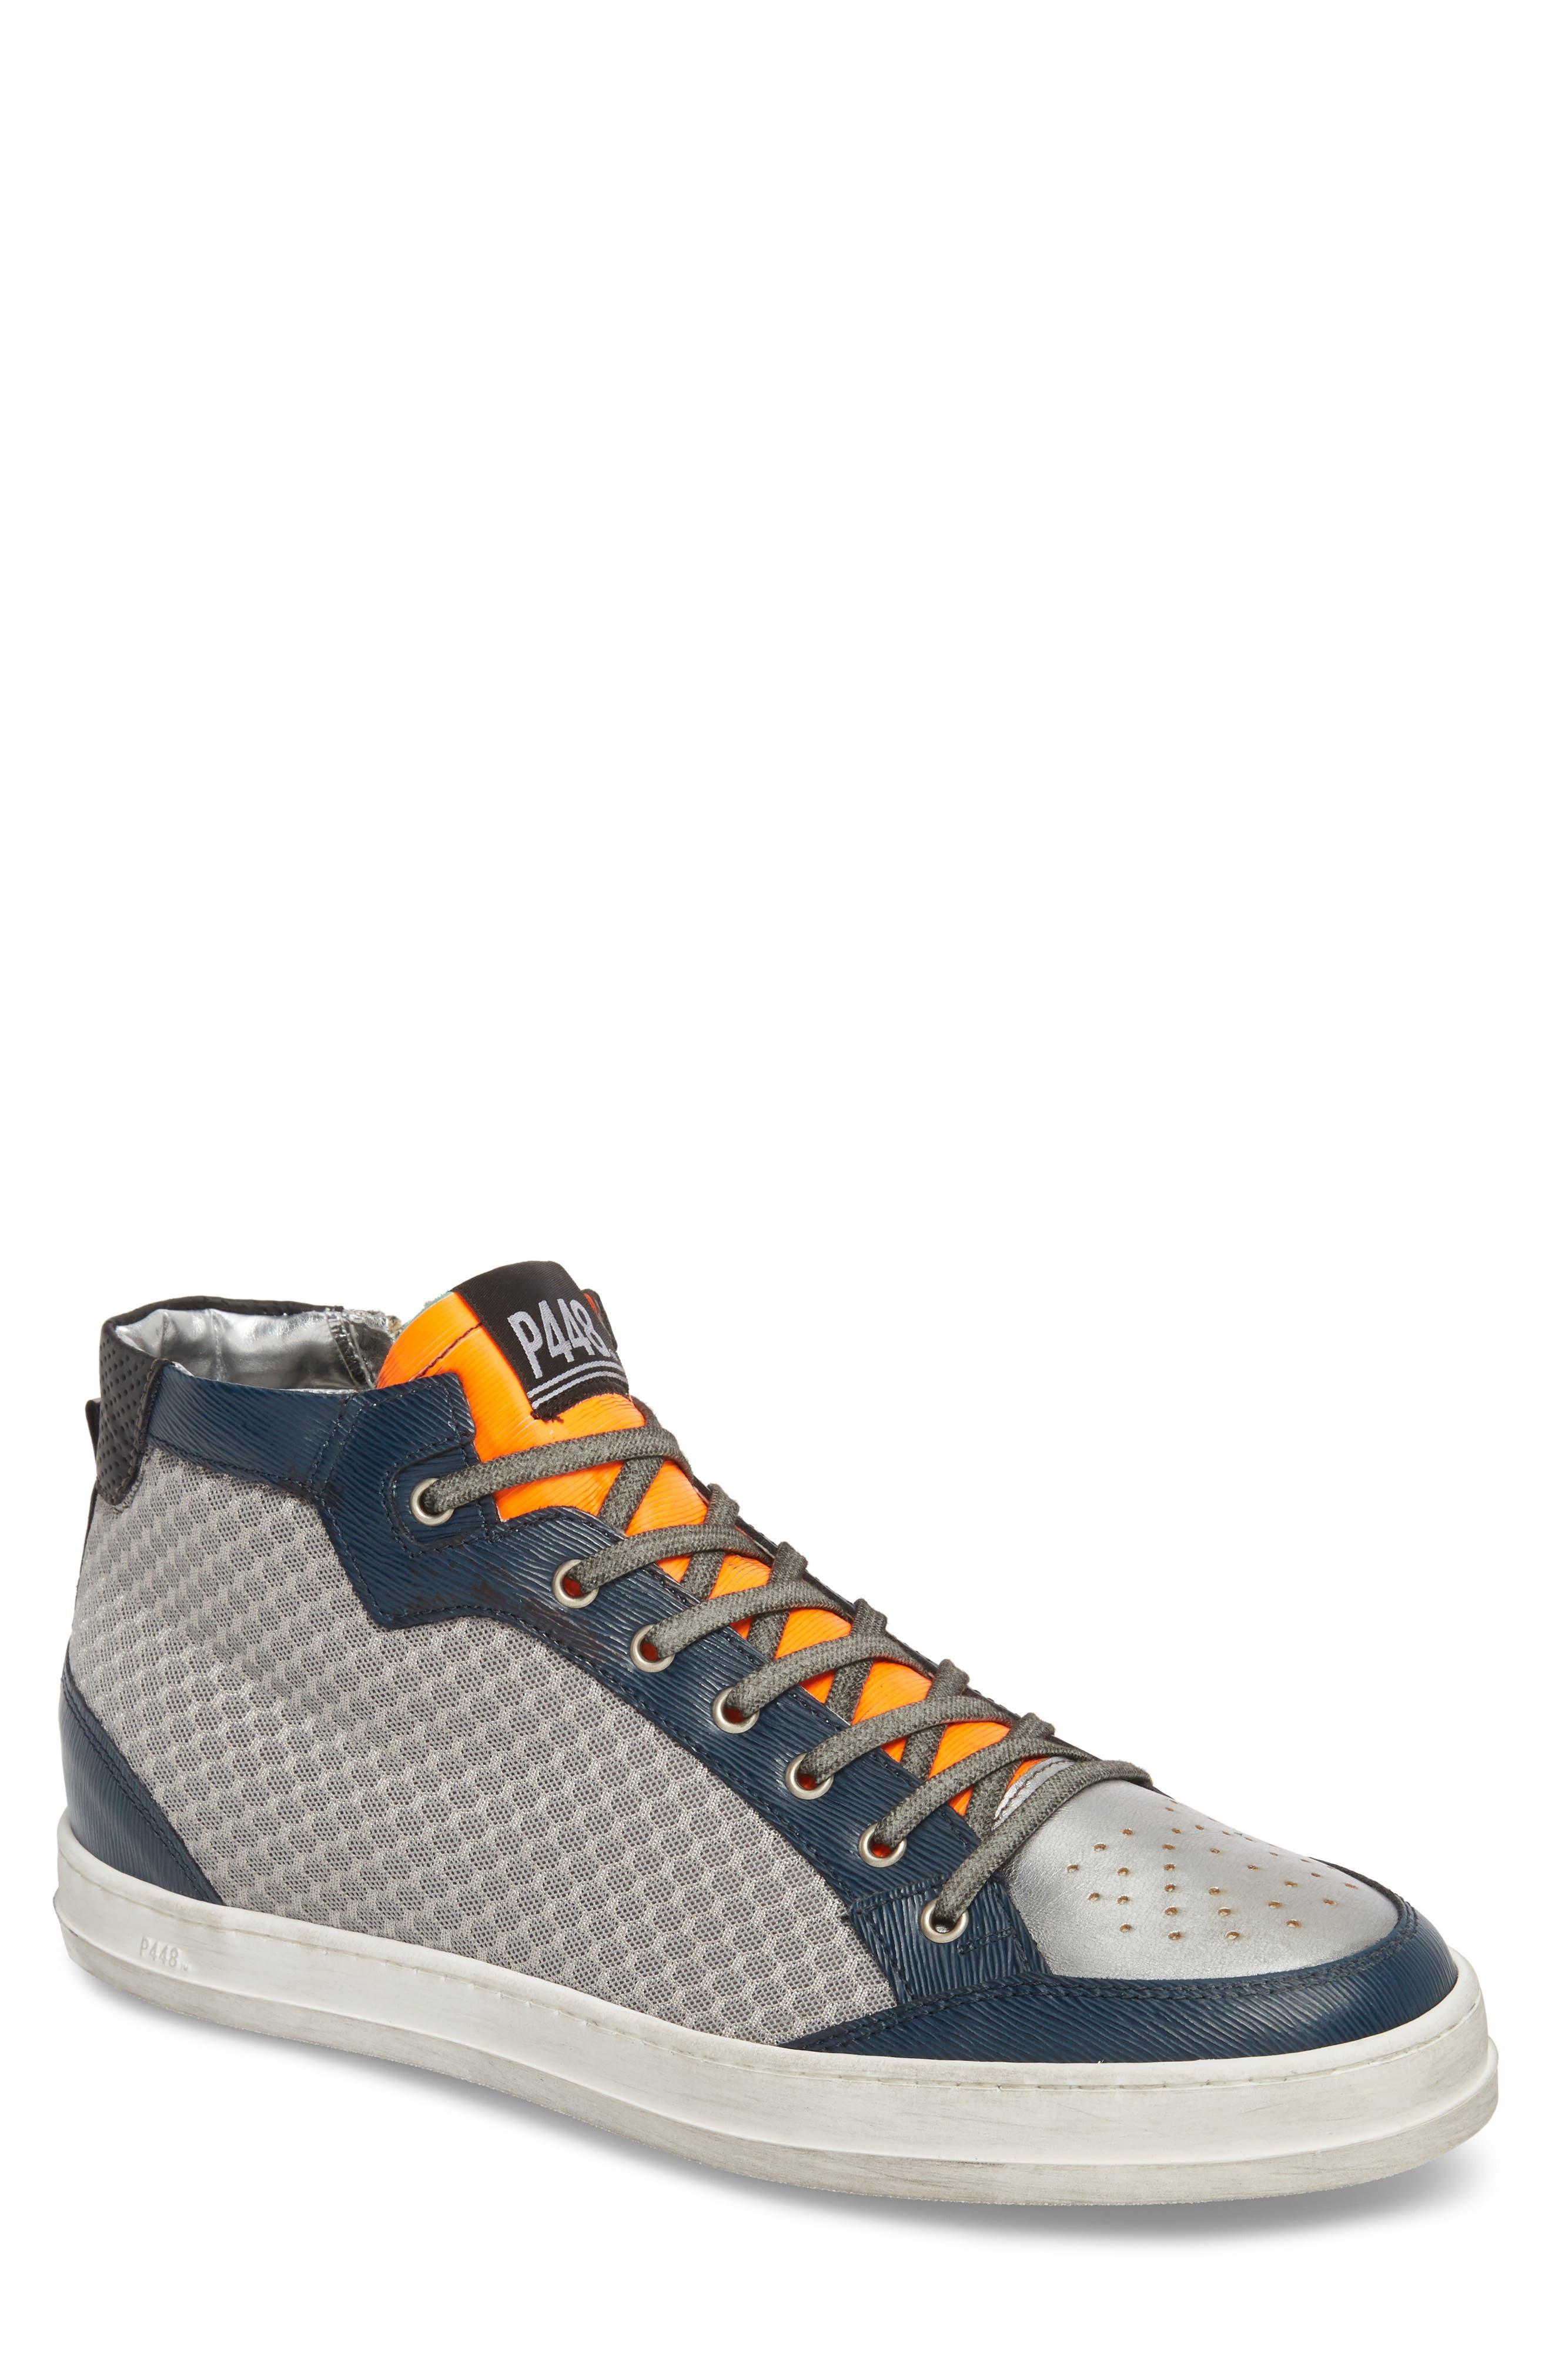 P448 | Love High Top Sneaker